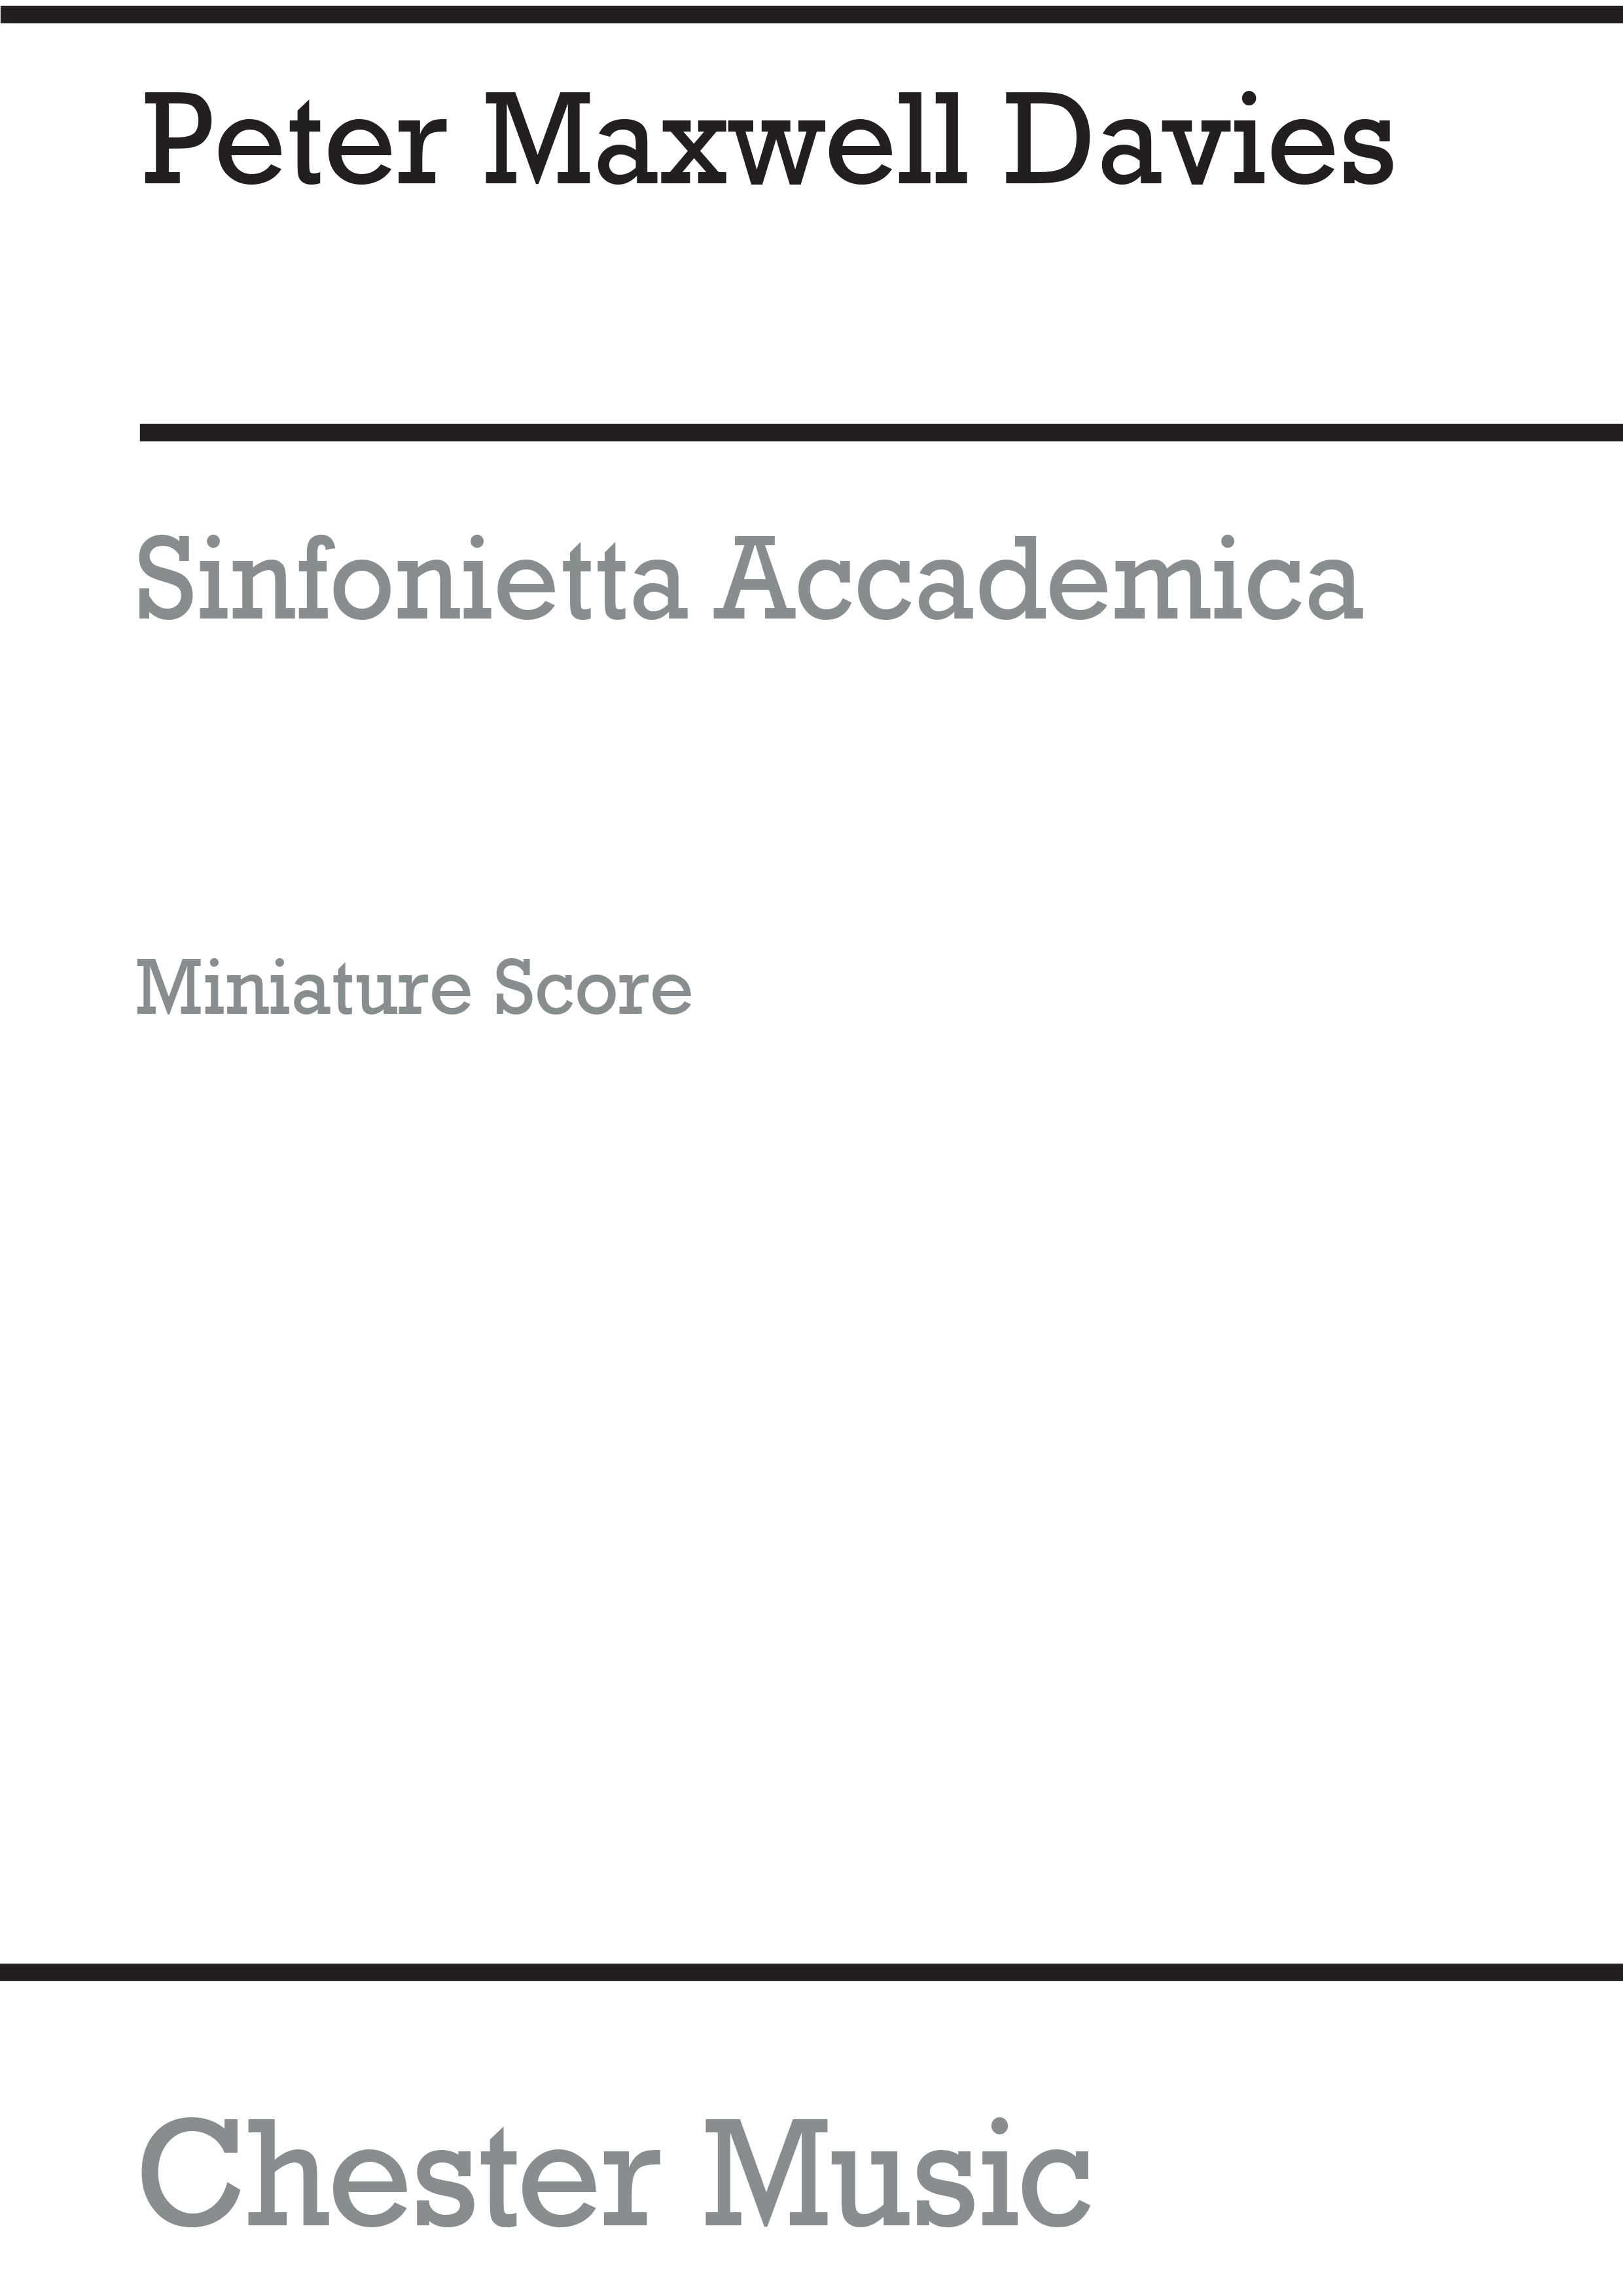 Peter Maxwell Davies: Sinfonietta Accademica: Orchestra: Miniature Score